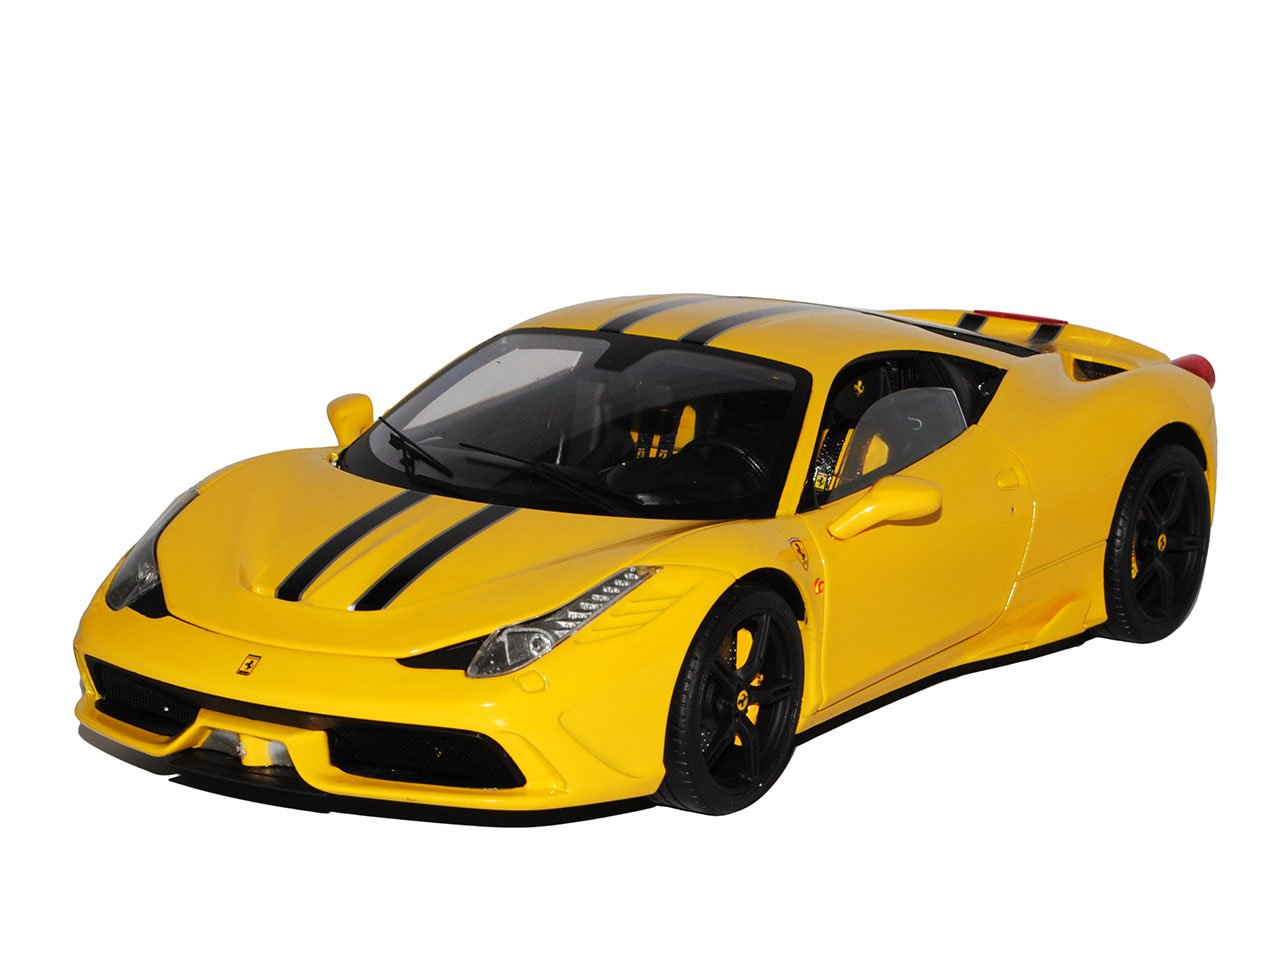 Ferrari 458 Speciale Coupe Coupe Coupe Gelb mit Streifen Ab 2013 1/18 Mattel Elite Modell Auto 12f936